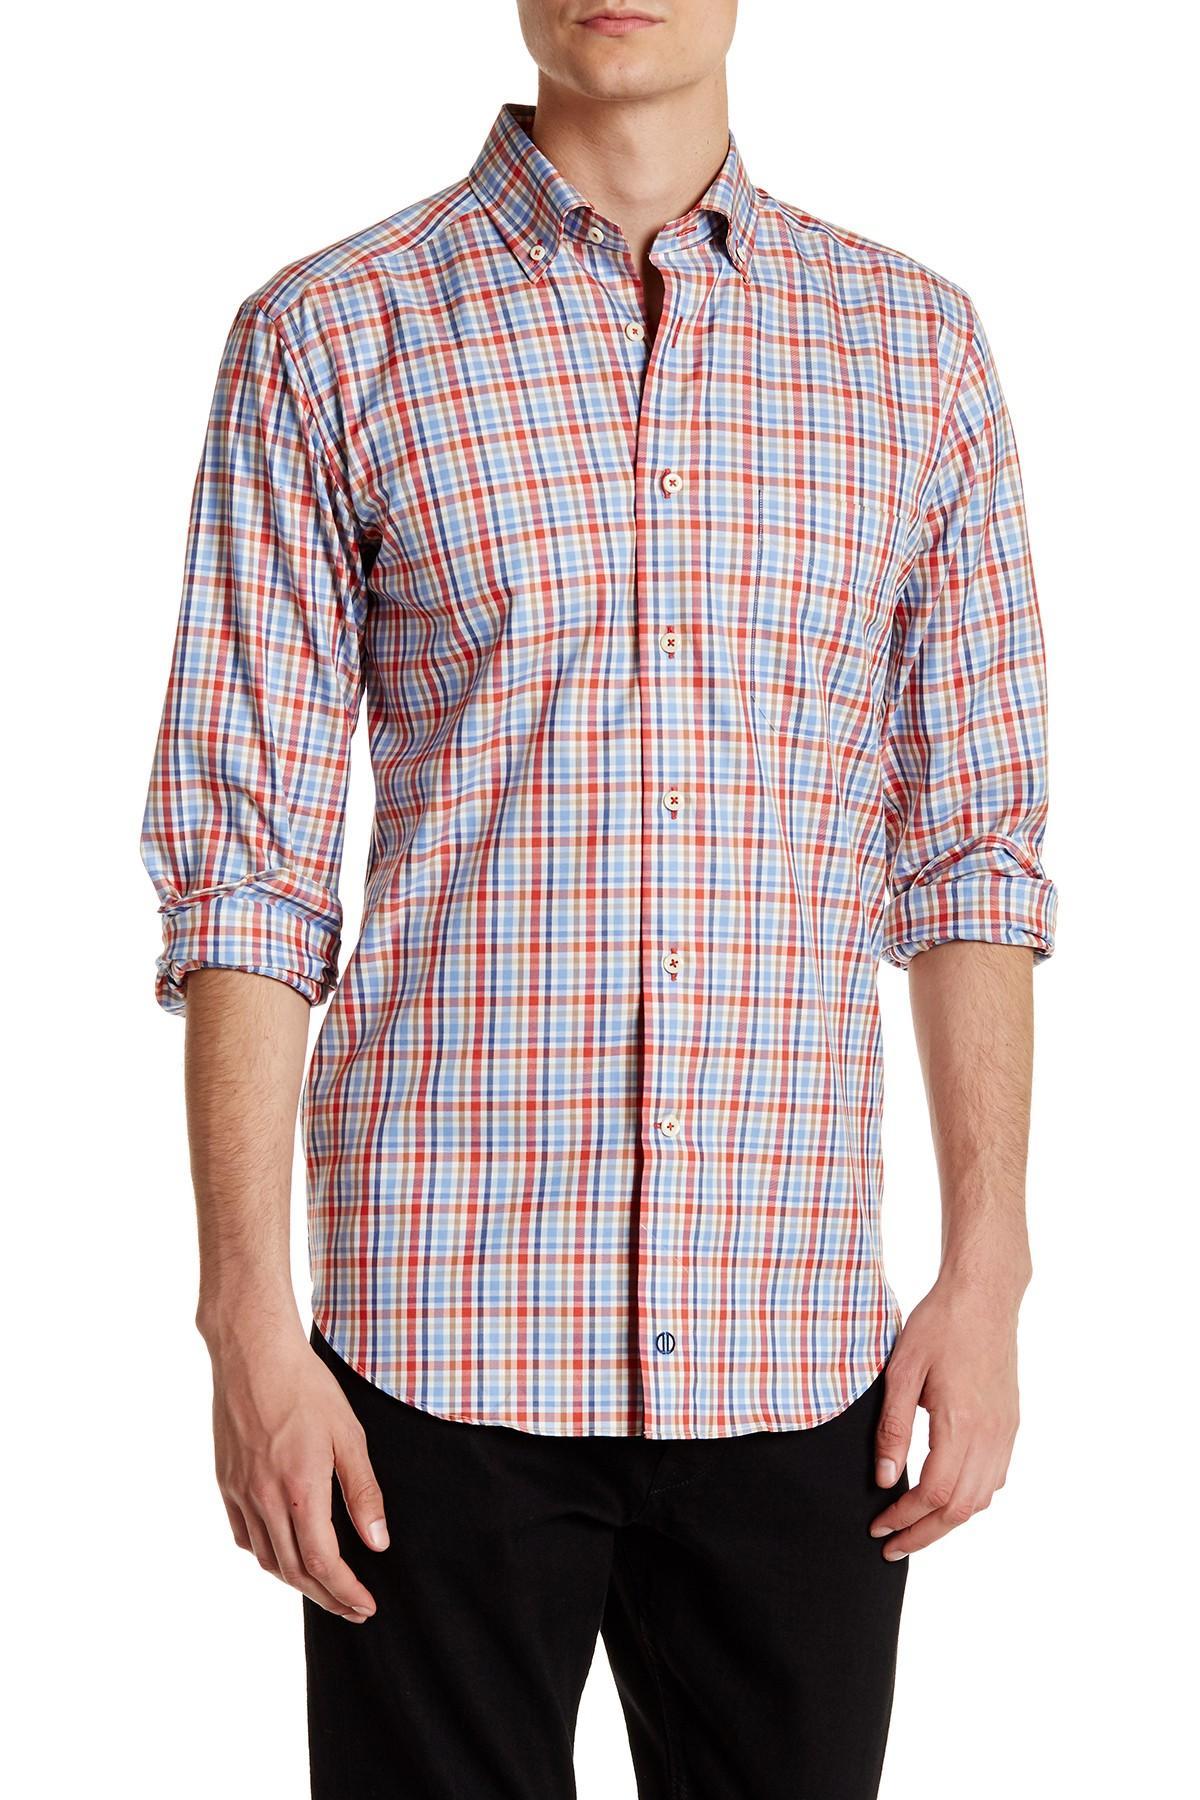 David Donahue Plaid Regular Fit Shirt In Blue For Men Lyst